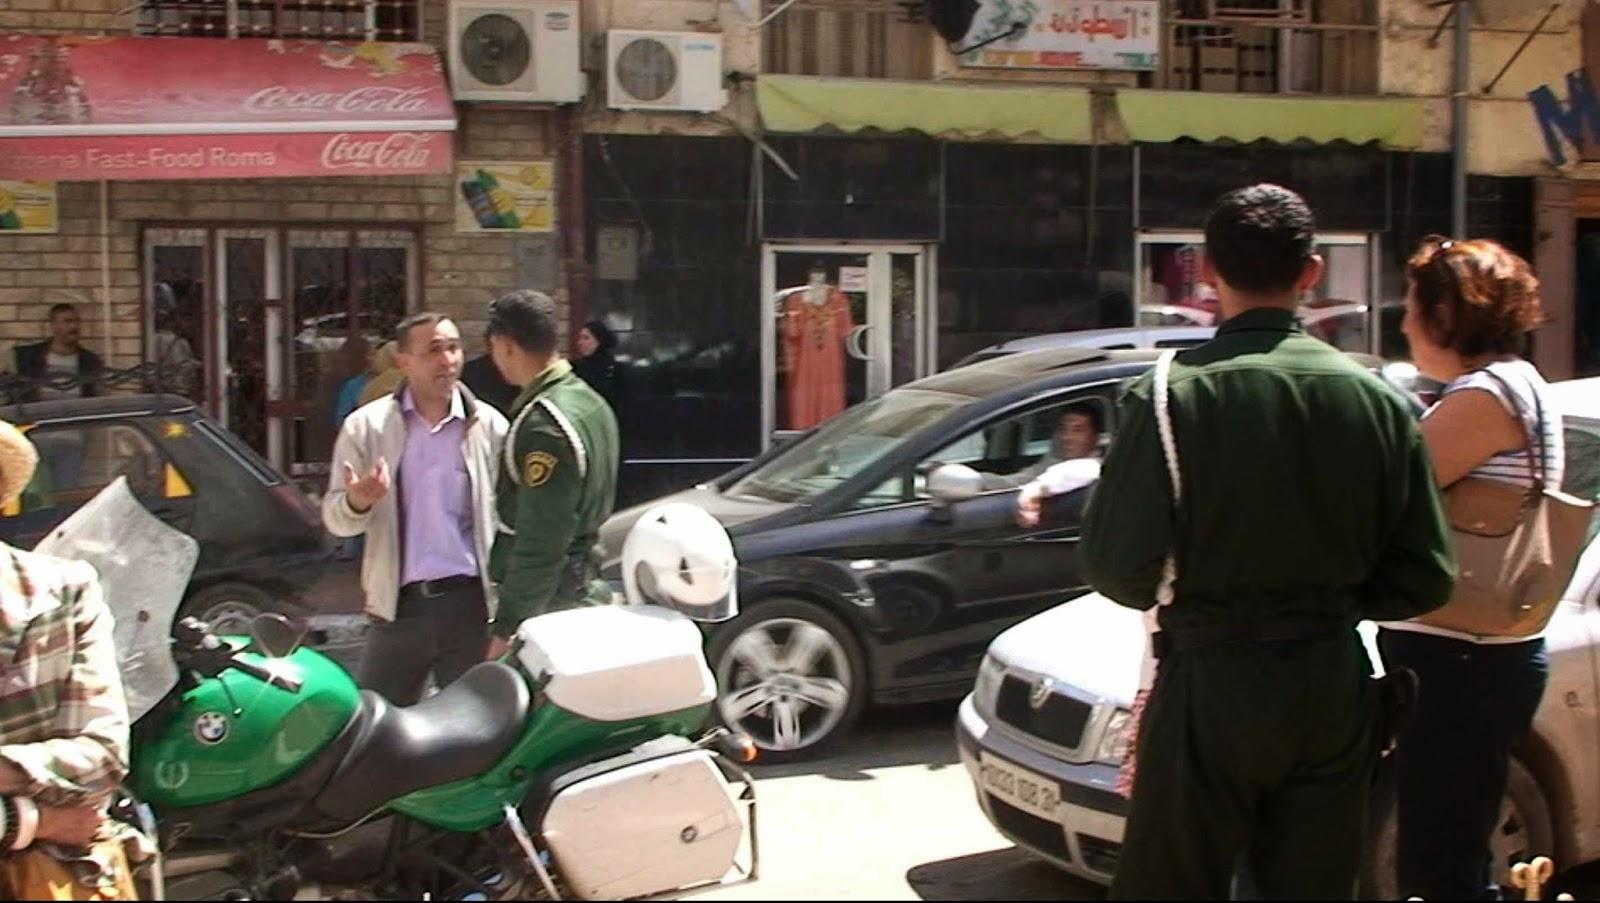 rencontre gay oran algerie à Tremblay-en-France